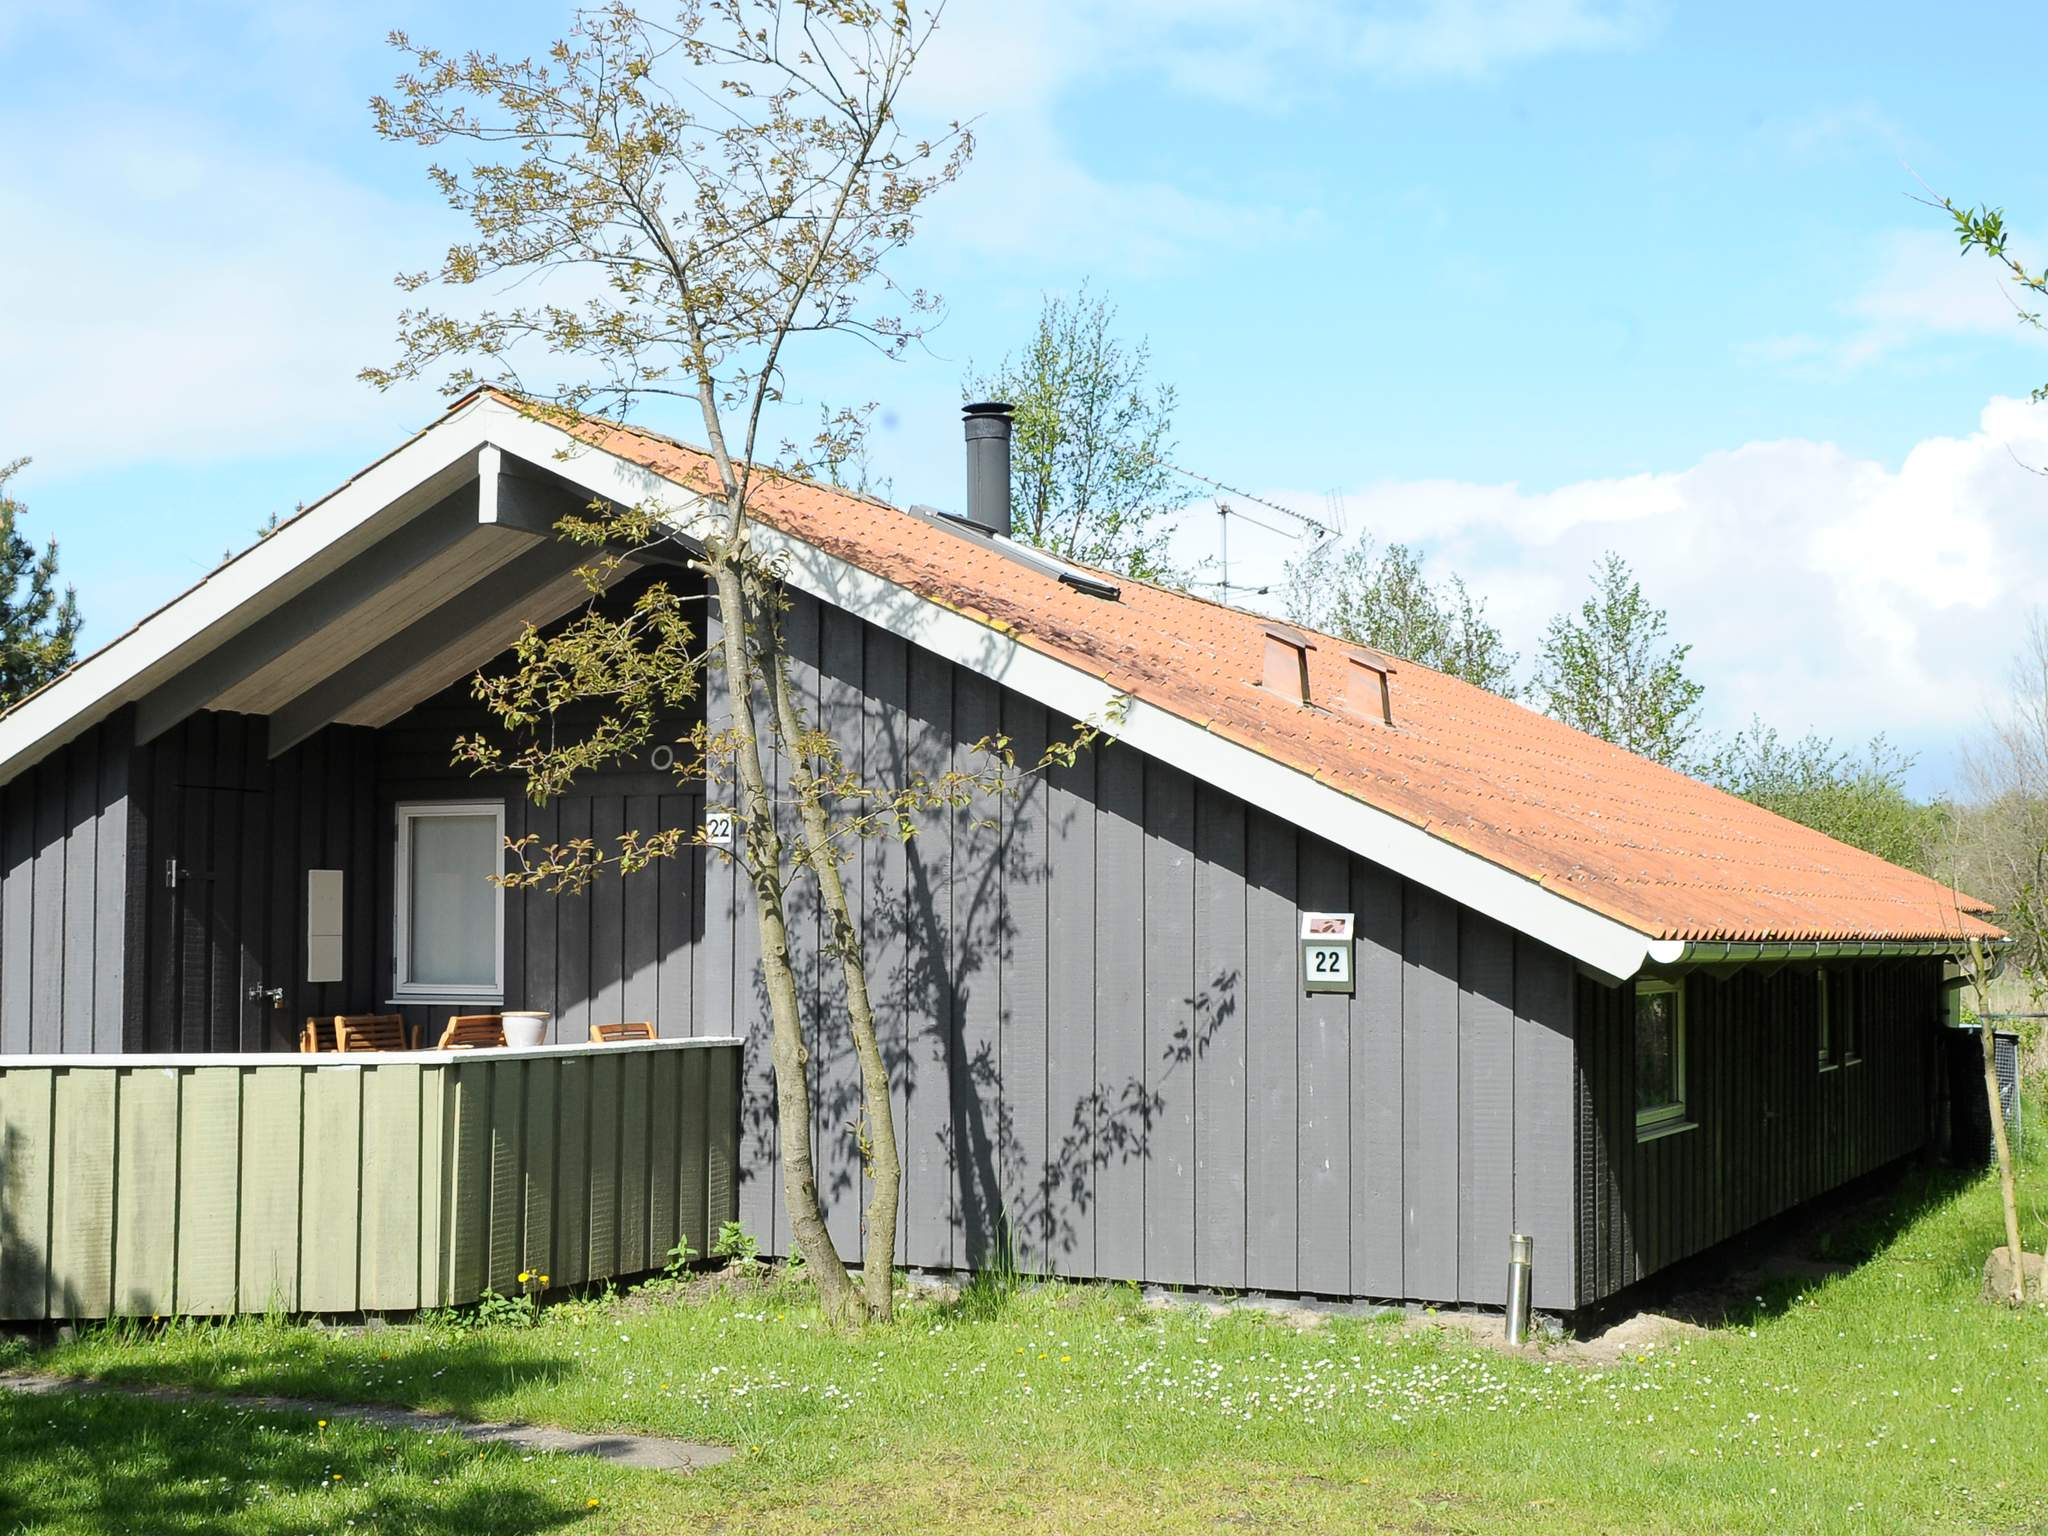 Ferienhaus Ristinge (93203), Ristinge, , Langeland, Dänemark, Bild 25